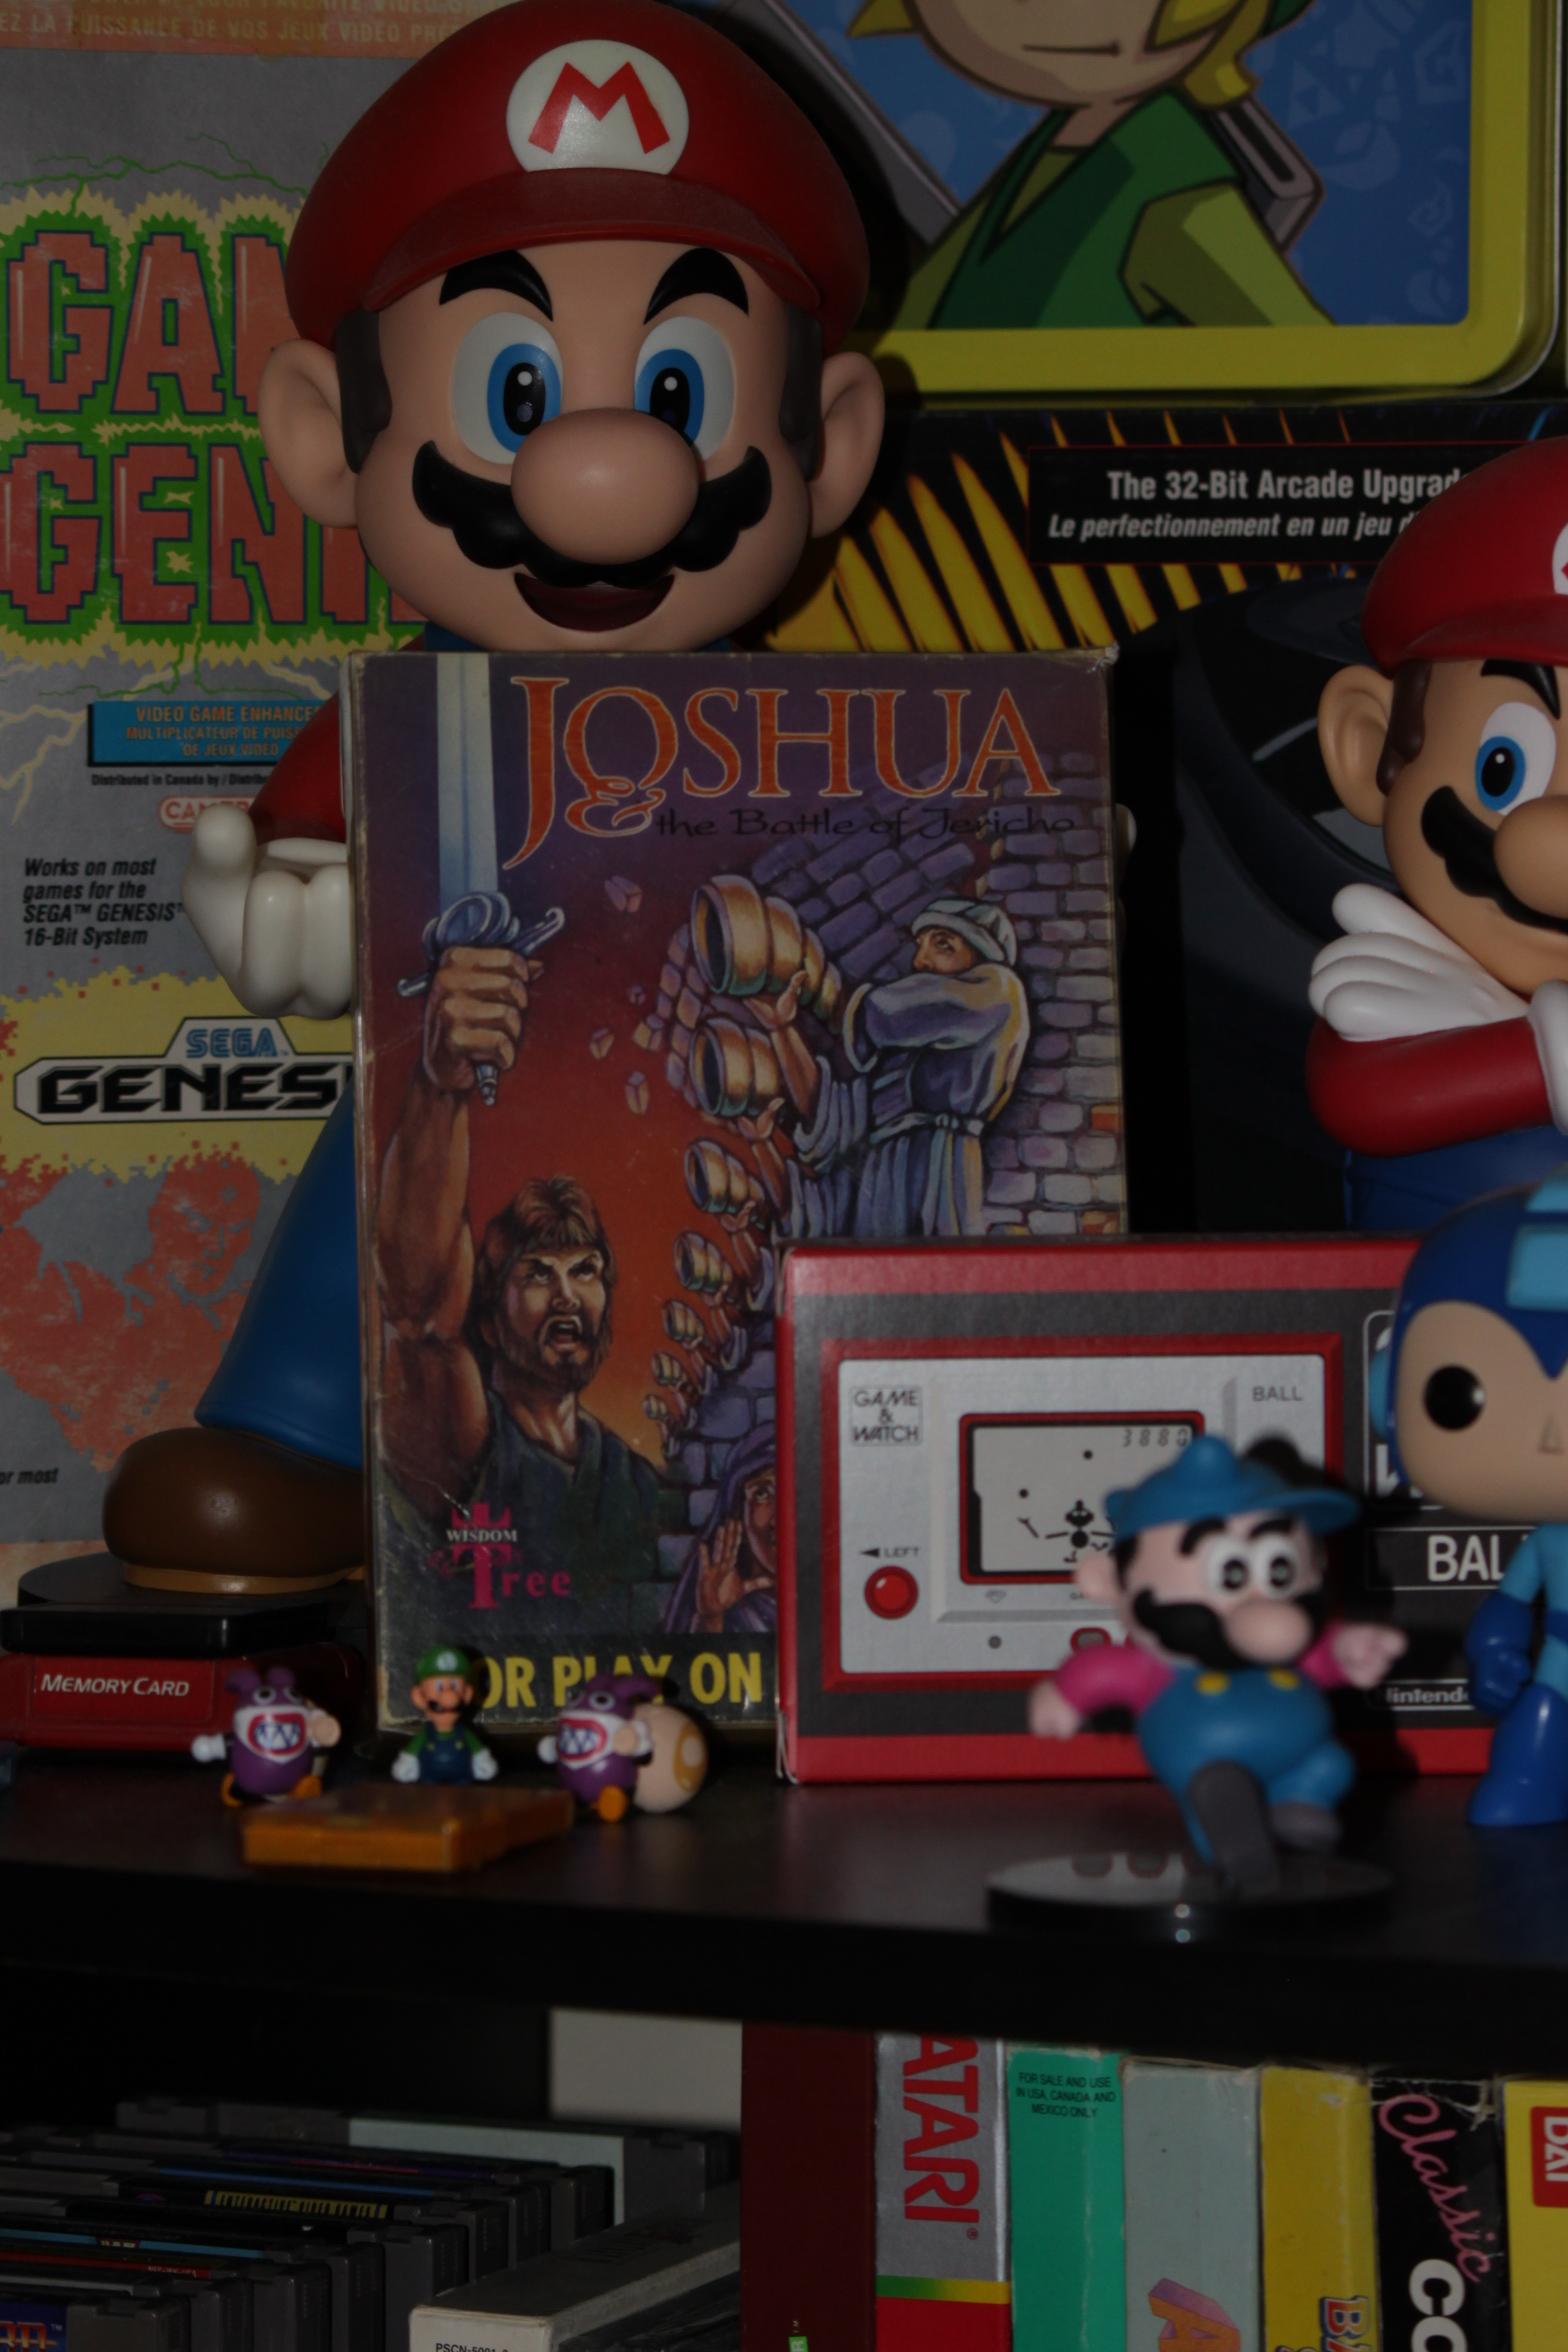 exosilver: Joshua & The Battle Of Jericho [Level 1 Start] (NES/Famicom) 40,220 points on 2016-11-27 19:21:12